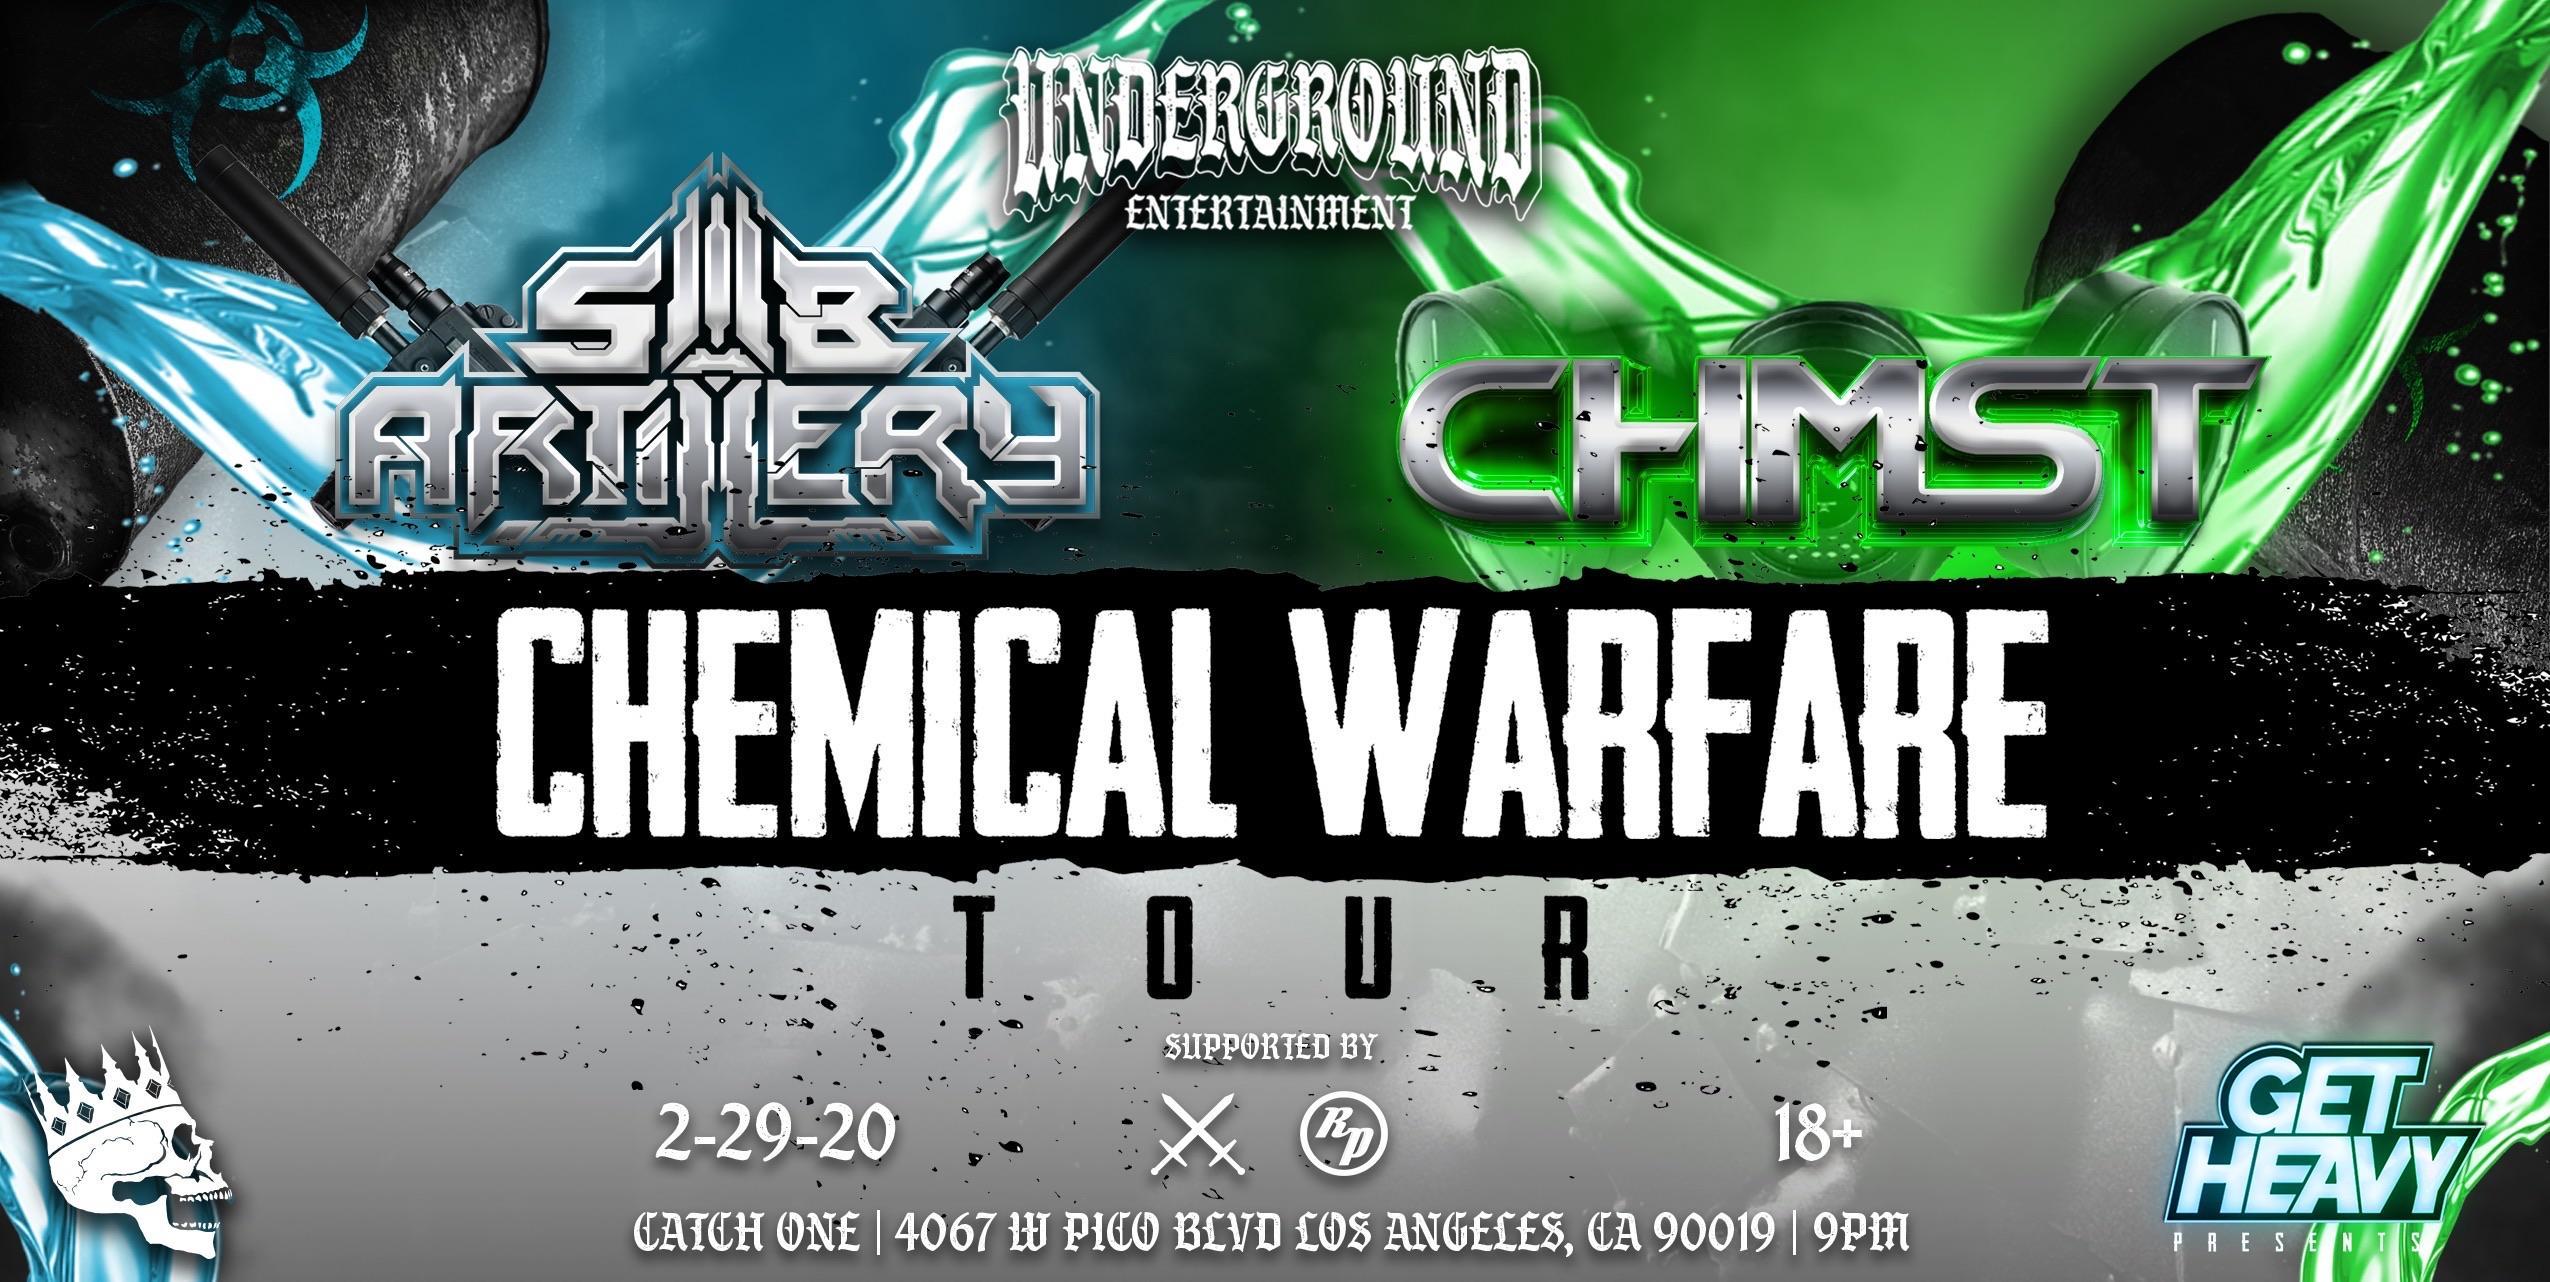 CHEMICAL WARFARE TOUR - SUB ARTILLERY / CHMST Feb. 29